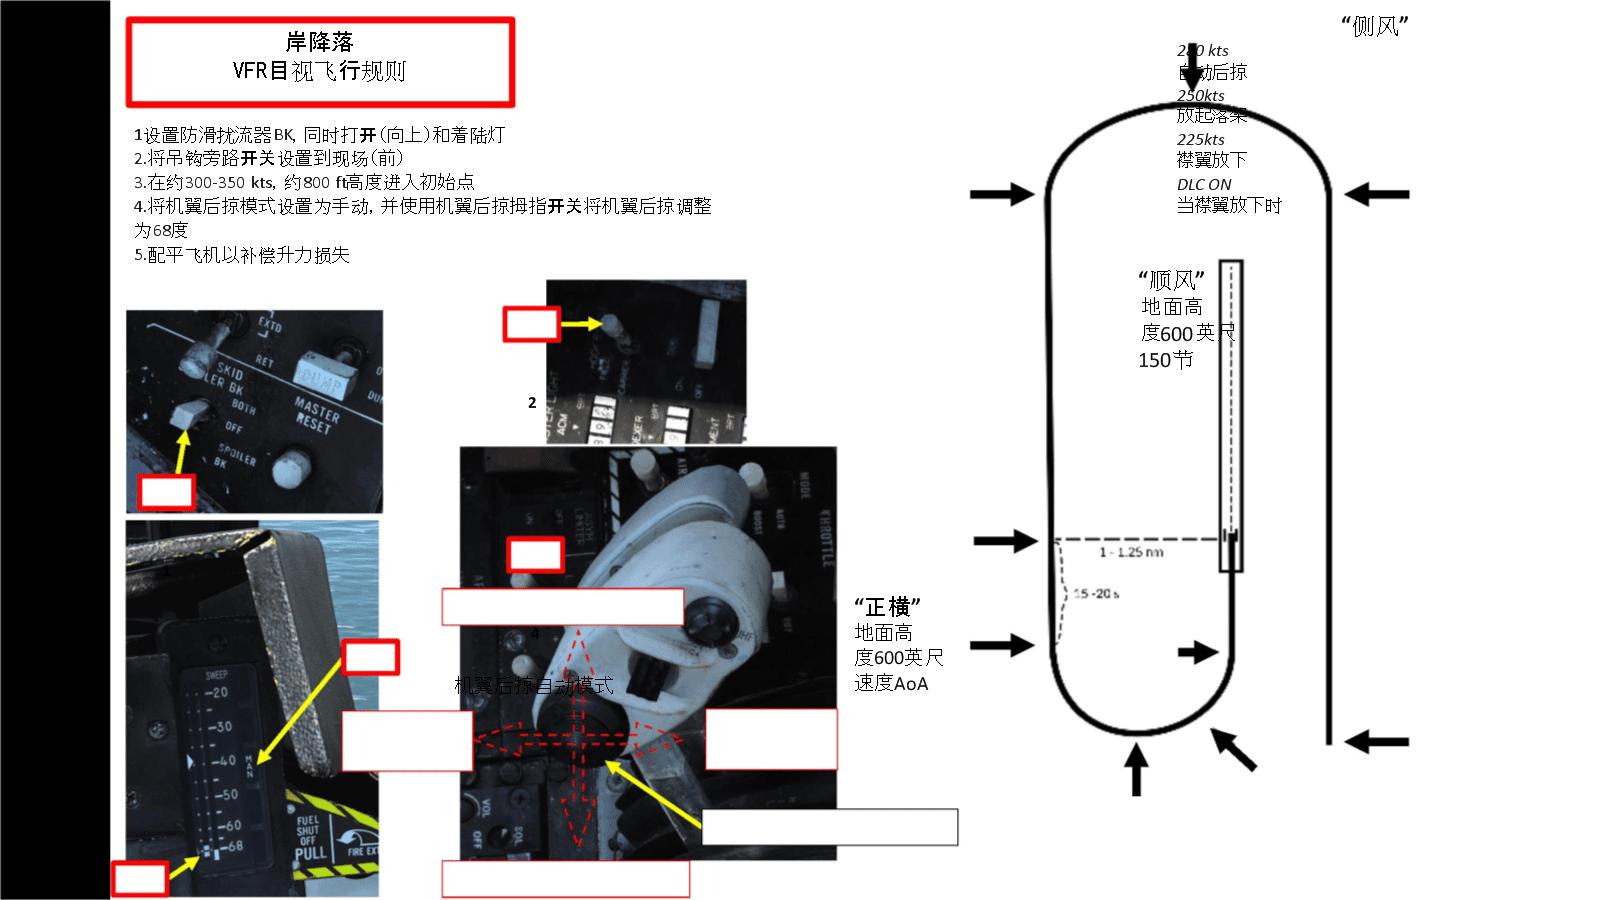 DCS F 14B Tomcat雄猫战斗机 中文指南 6.1岸降落VFR.docx